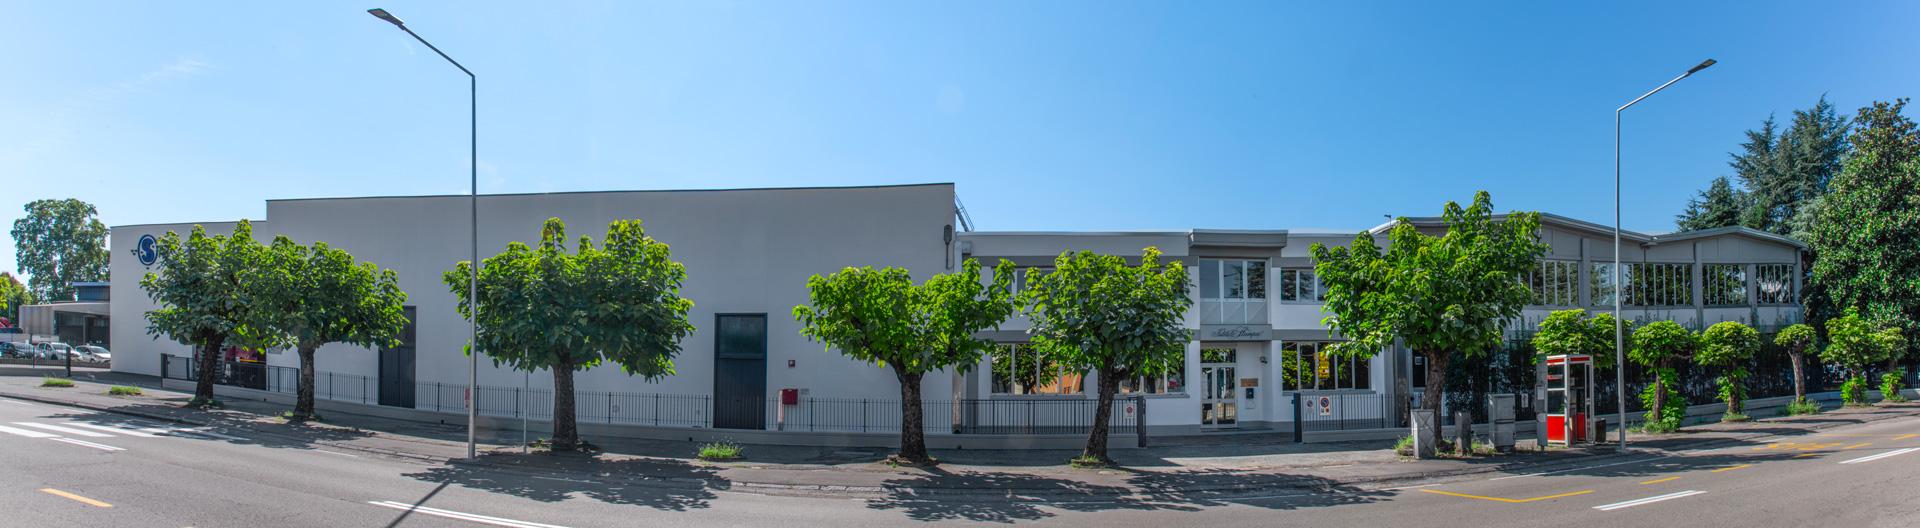 Société - Istituto Stampa